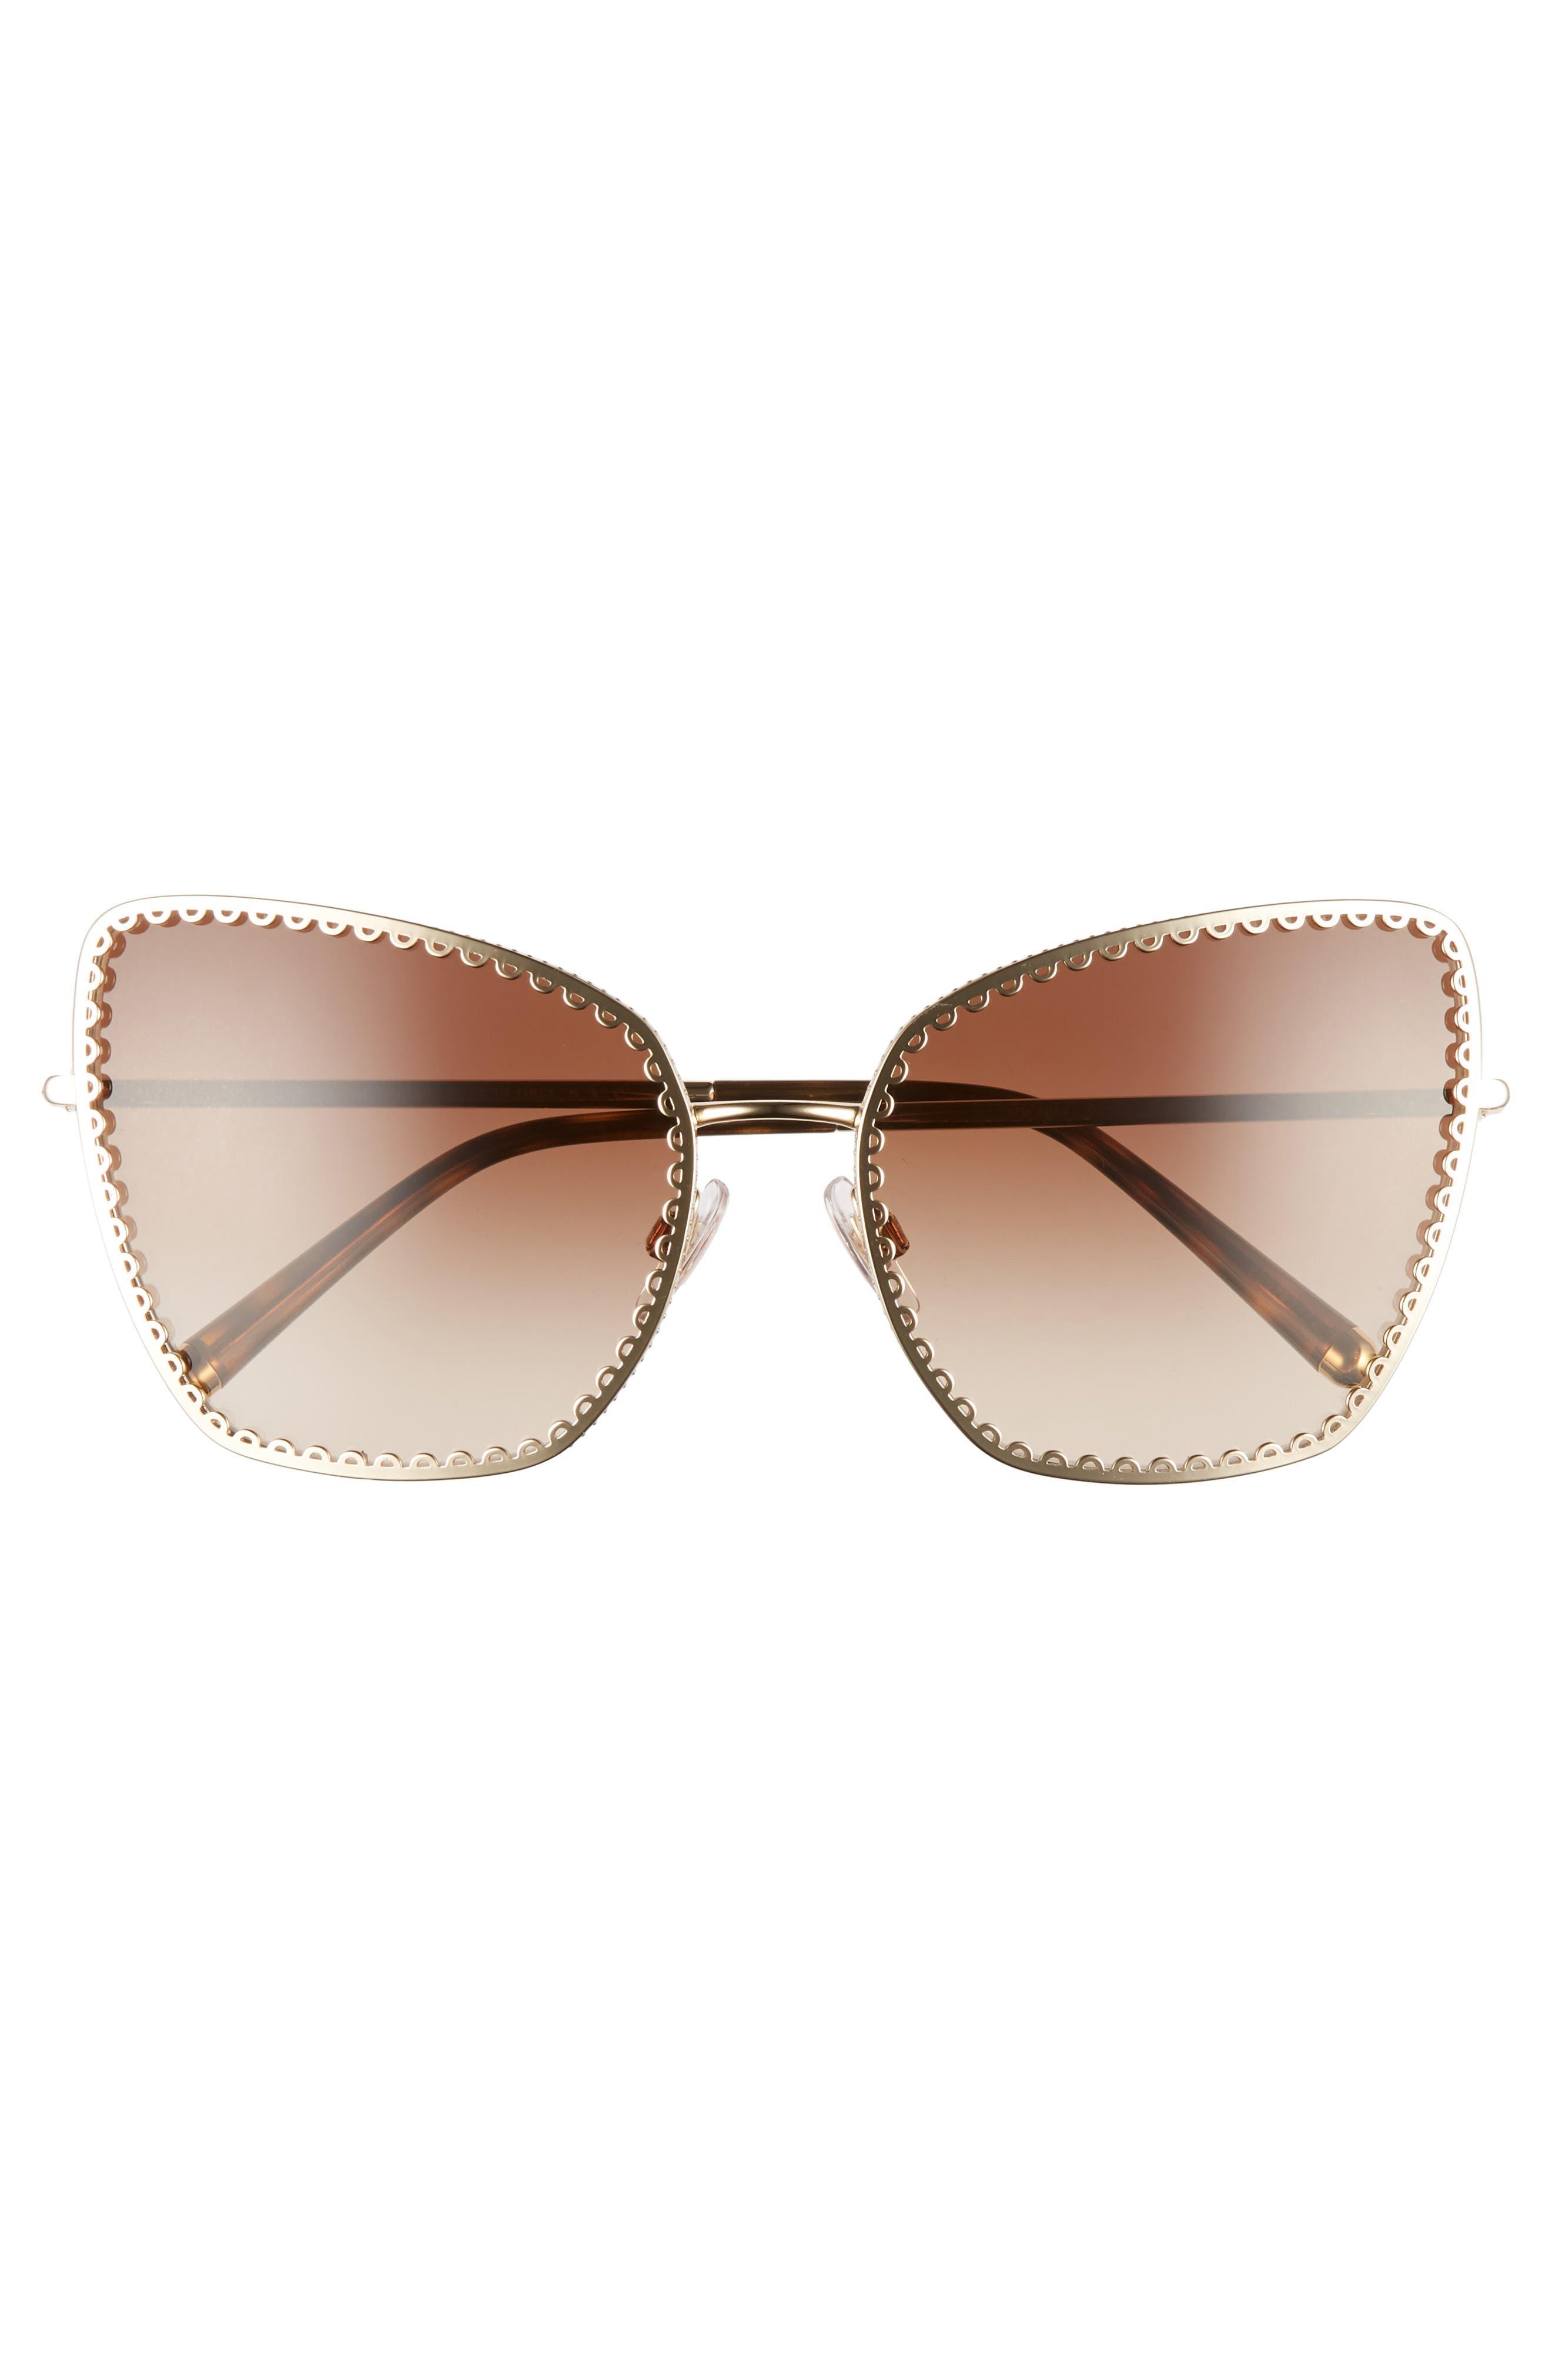 Sacred Heart 61mm Gradient Cat Eye Sunglasses,                             Alternate thumbnail 3, color,                             GOLD GRADIENT